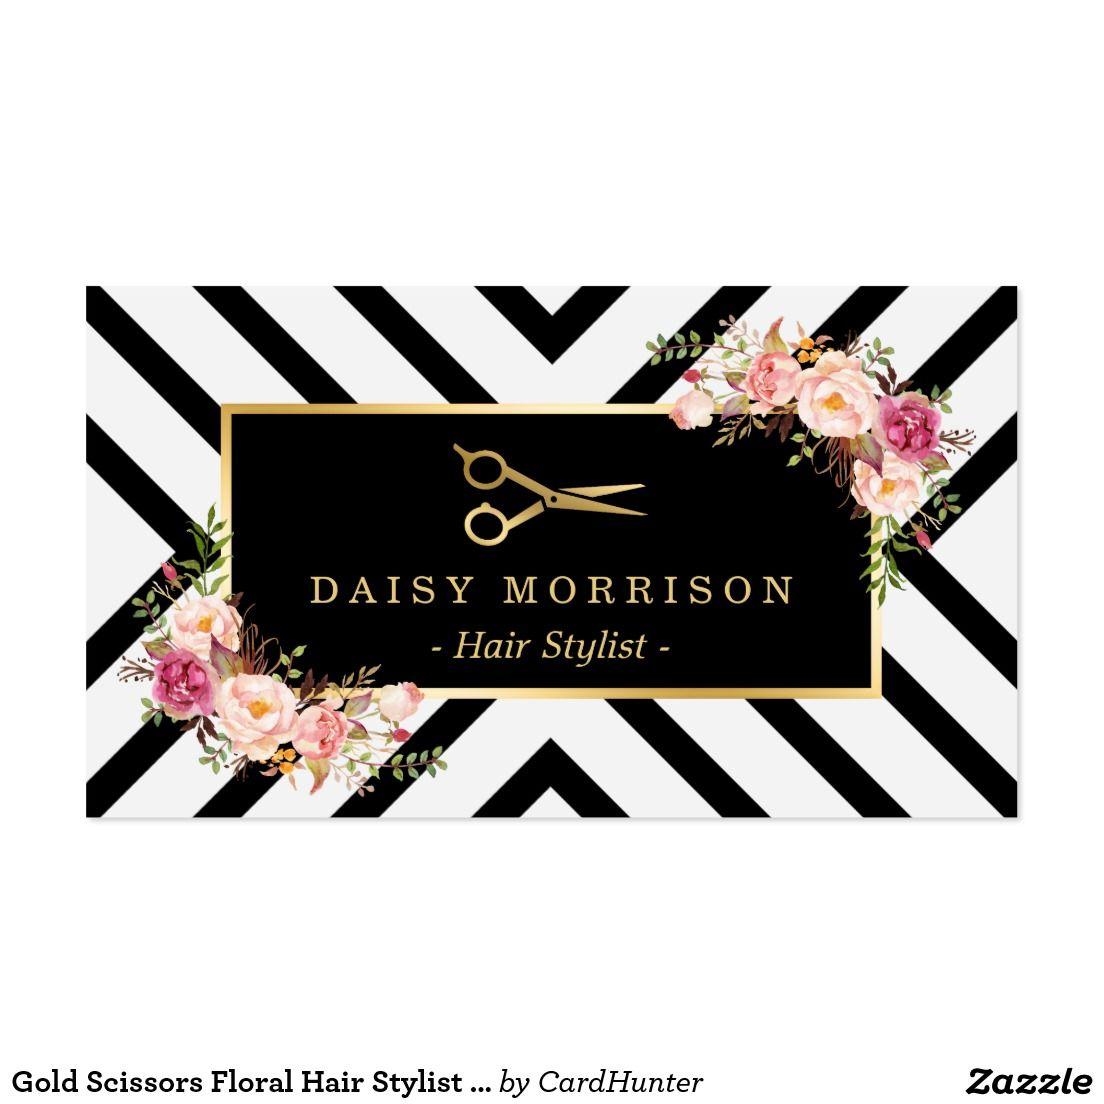 Gold scissors floral hair stylist beauty salon business card gold scissors floral hair stylist beauty salon business card magicingreecefo Image collections